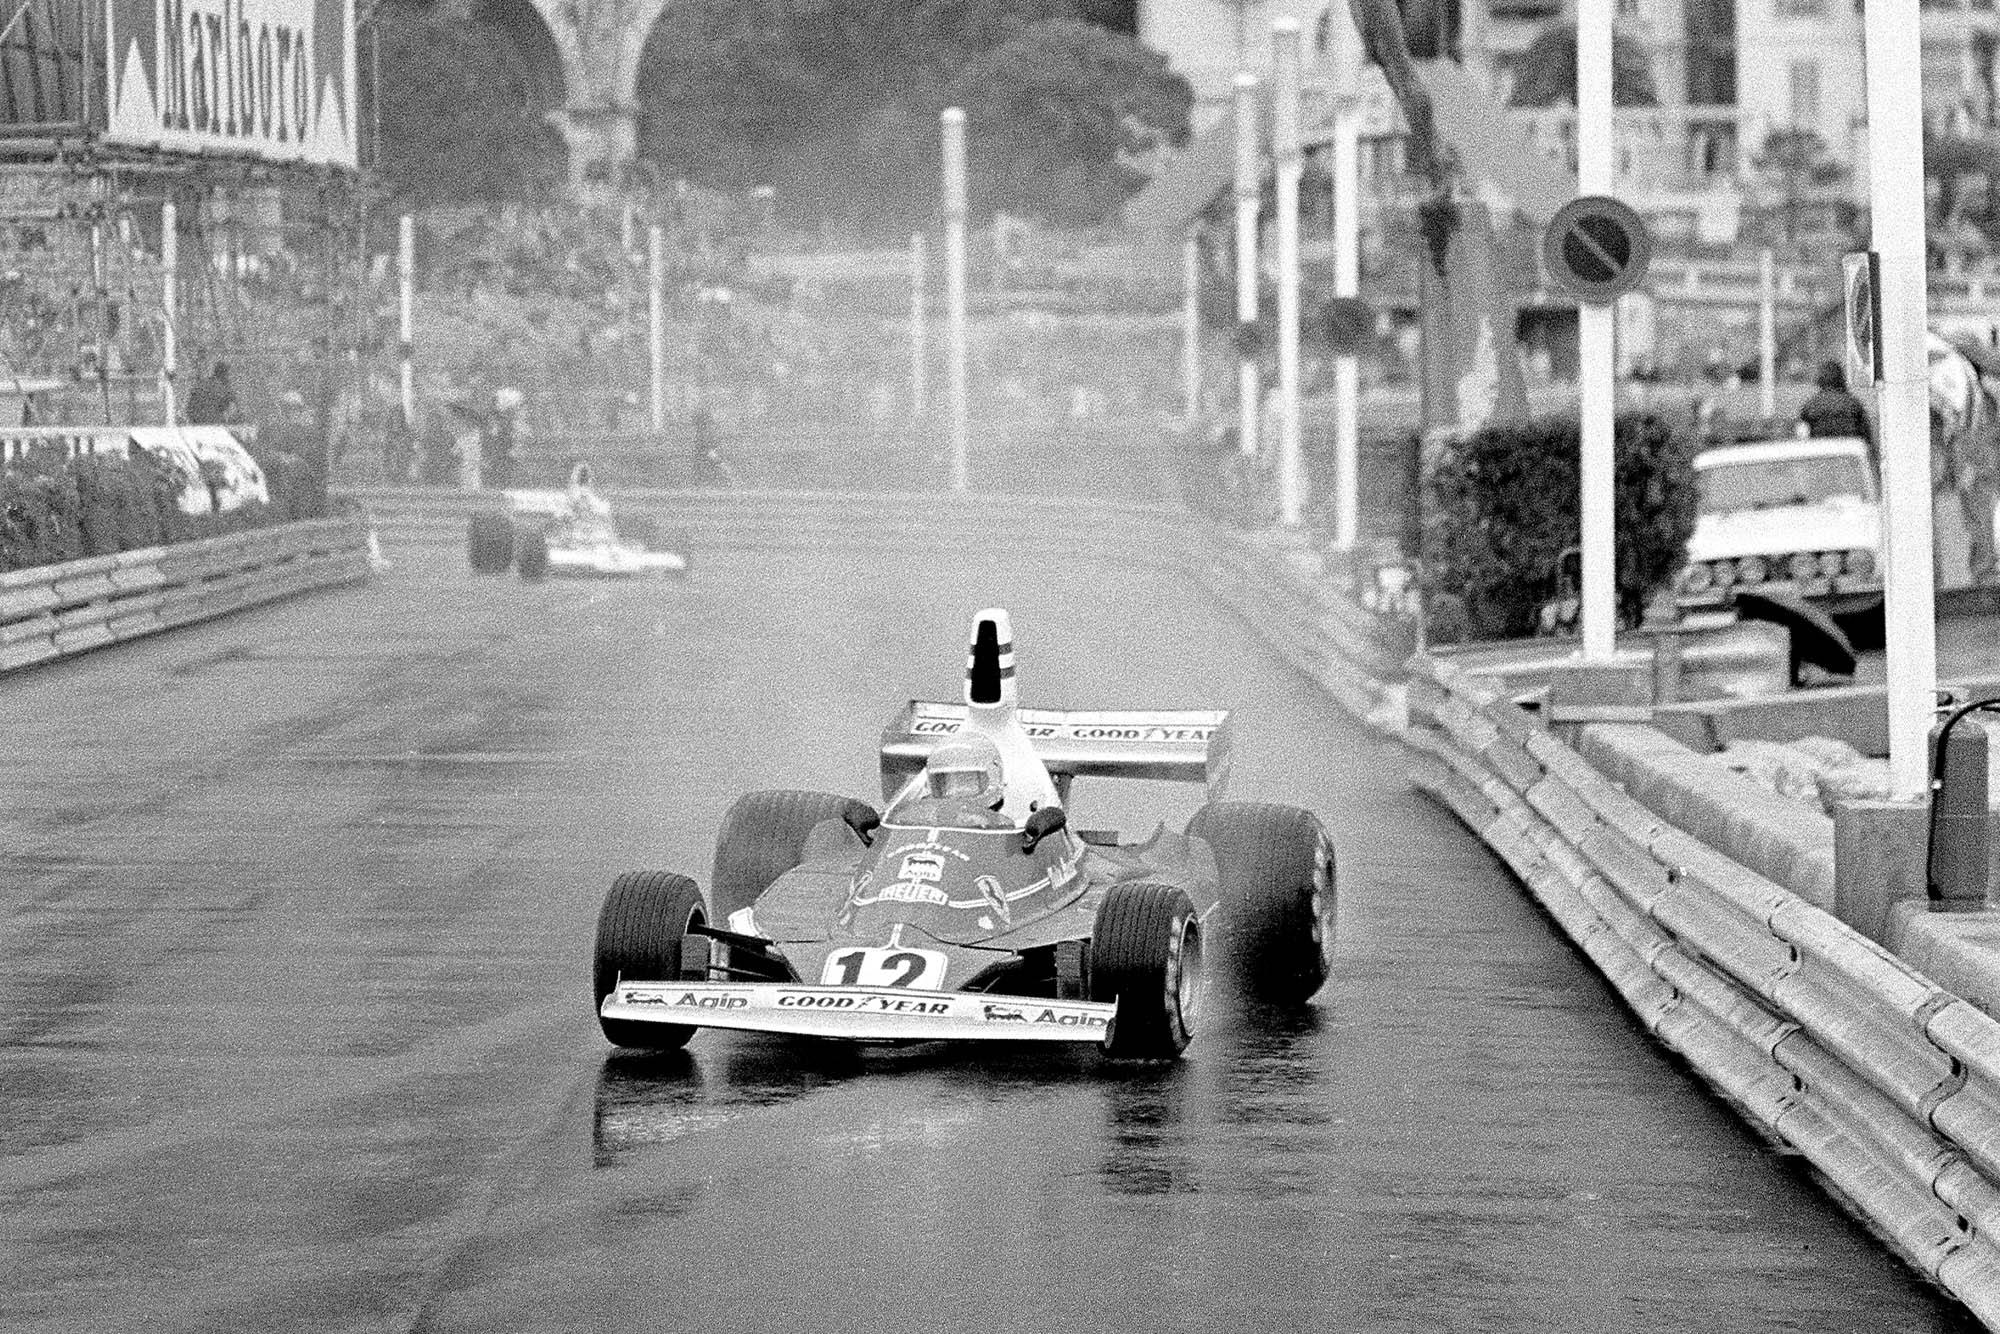 Niki Lauda leading the 1975 Monaco Grand Prix in his Ferrari 312T